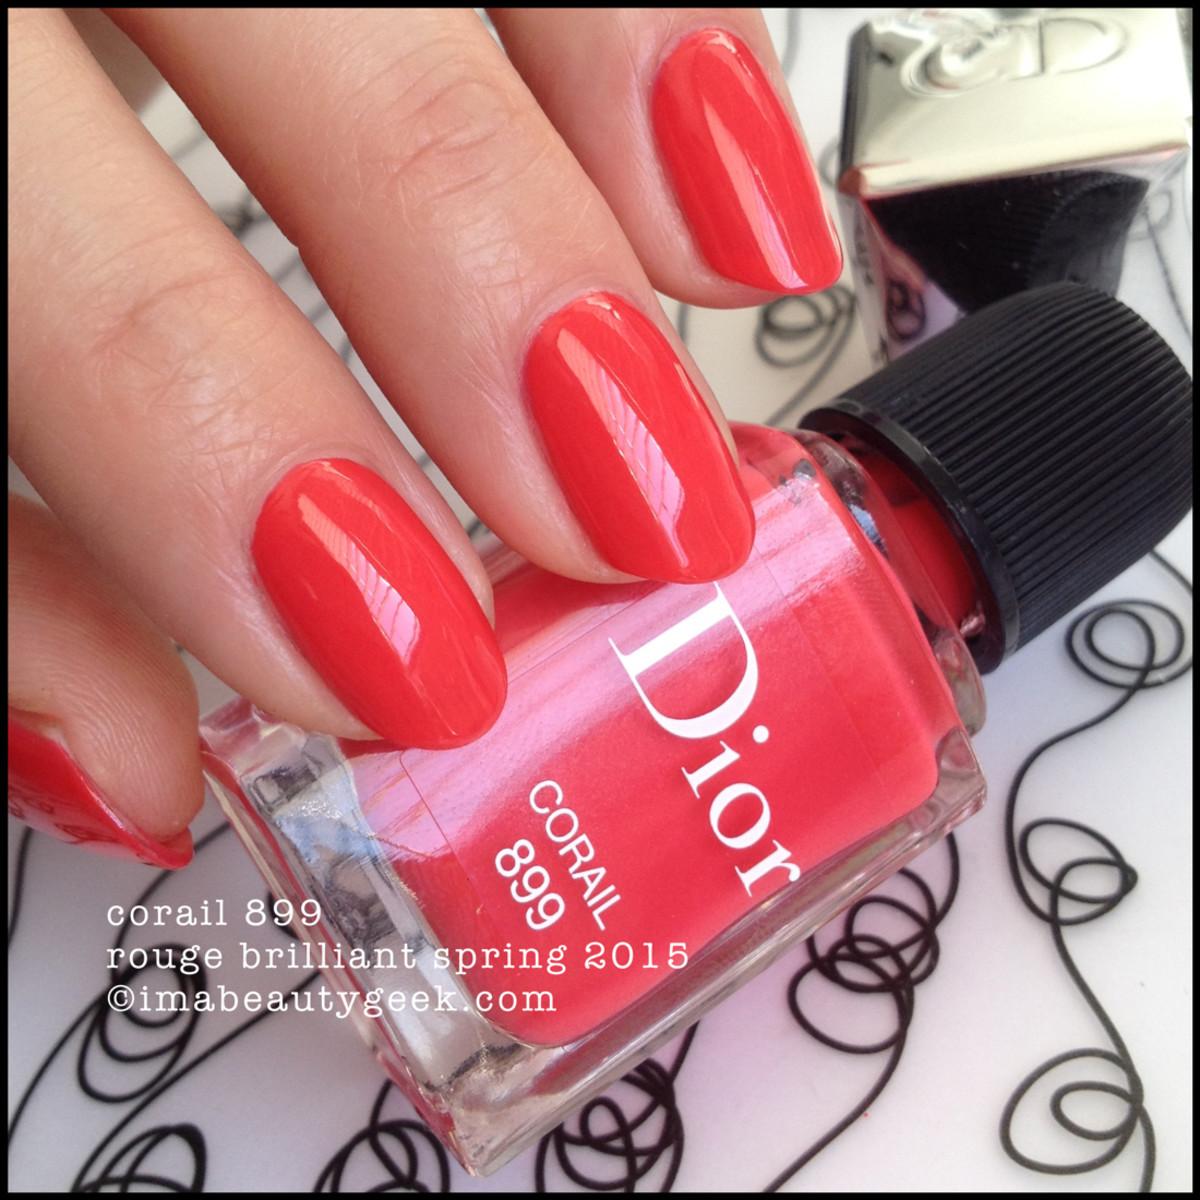 Dior Rouge Brilliant Spring 2015_Dior Vernis Corail 899